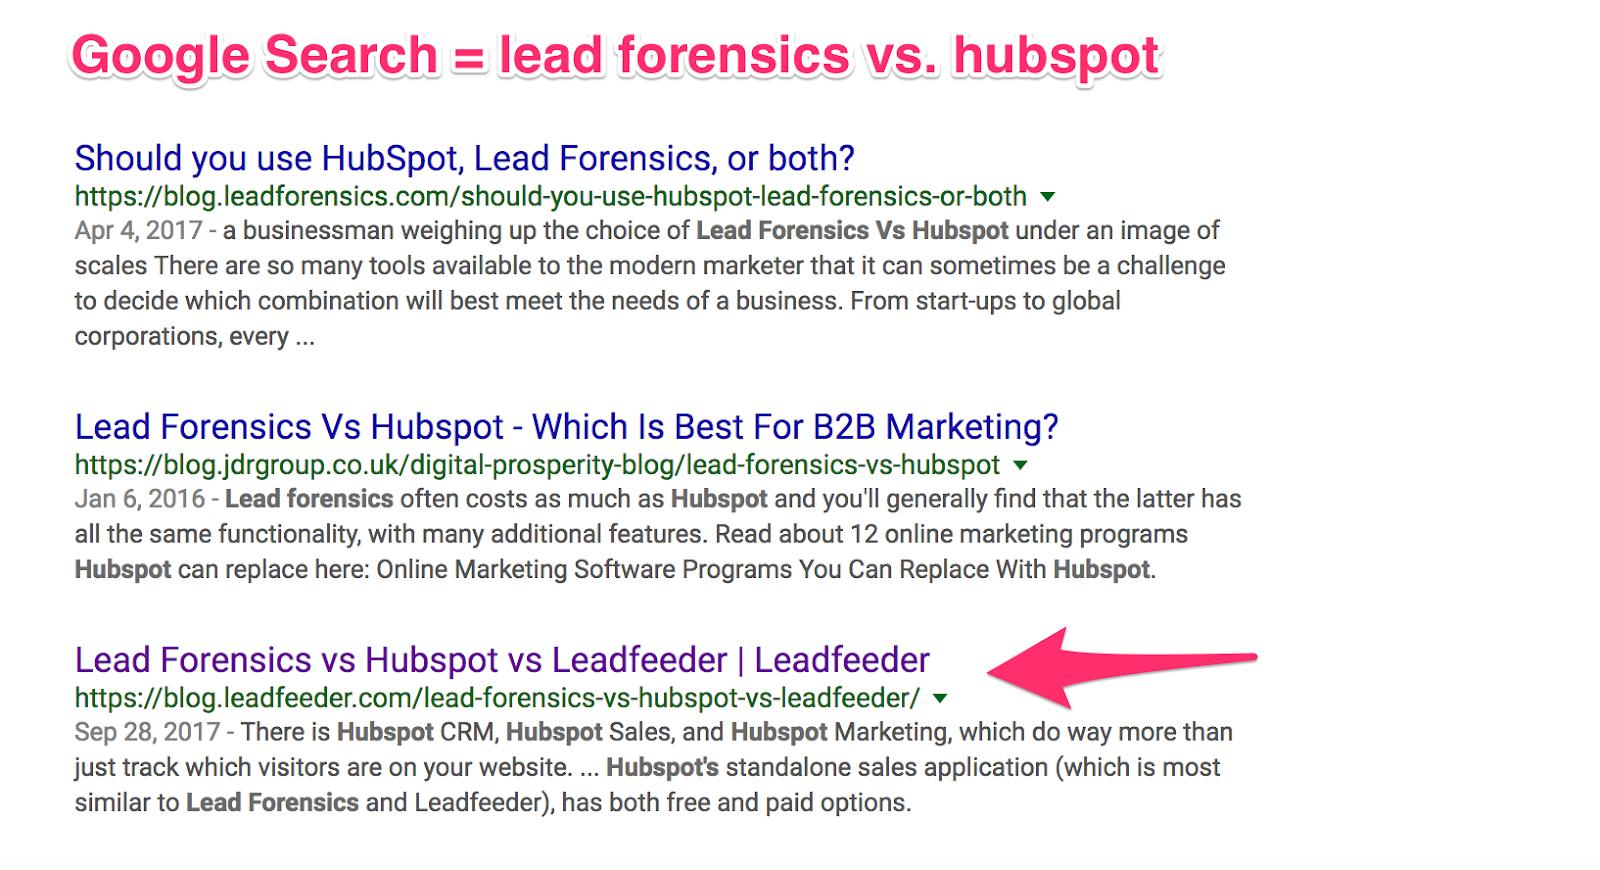 lead forensics vs hubspot Google Search 1